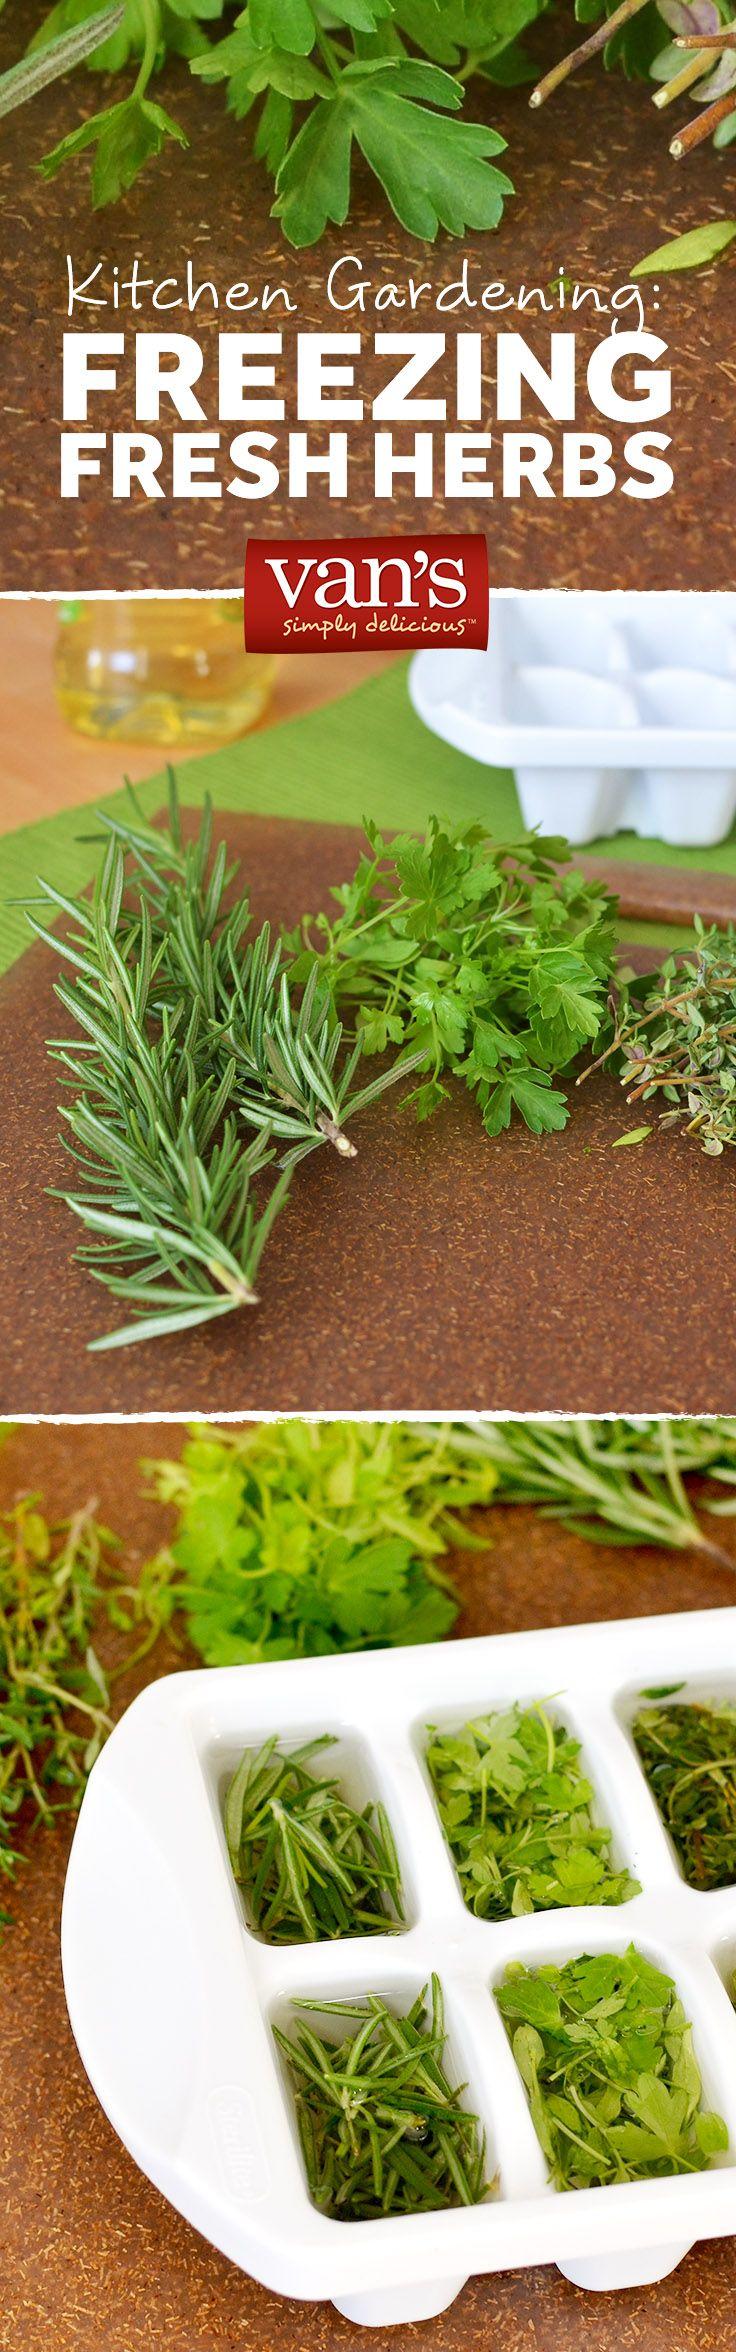 Kitchen Gardening Kitchen Gardening Looking For A Long Term Fix For Fresh Herbs